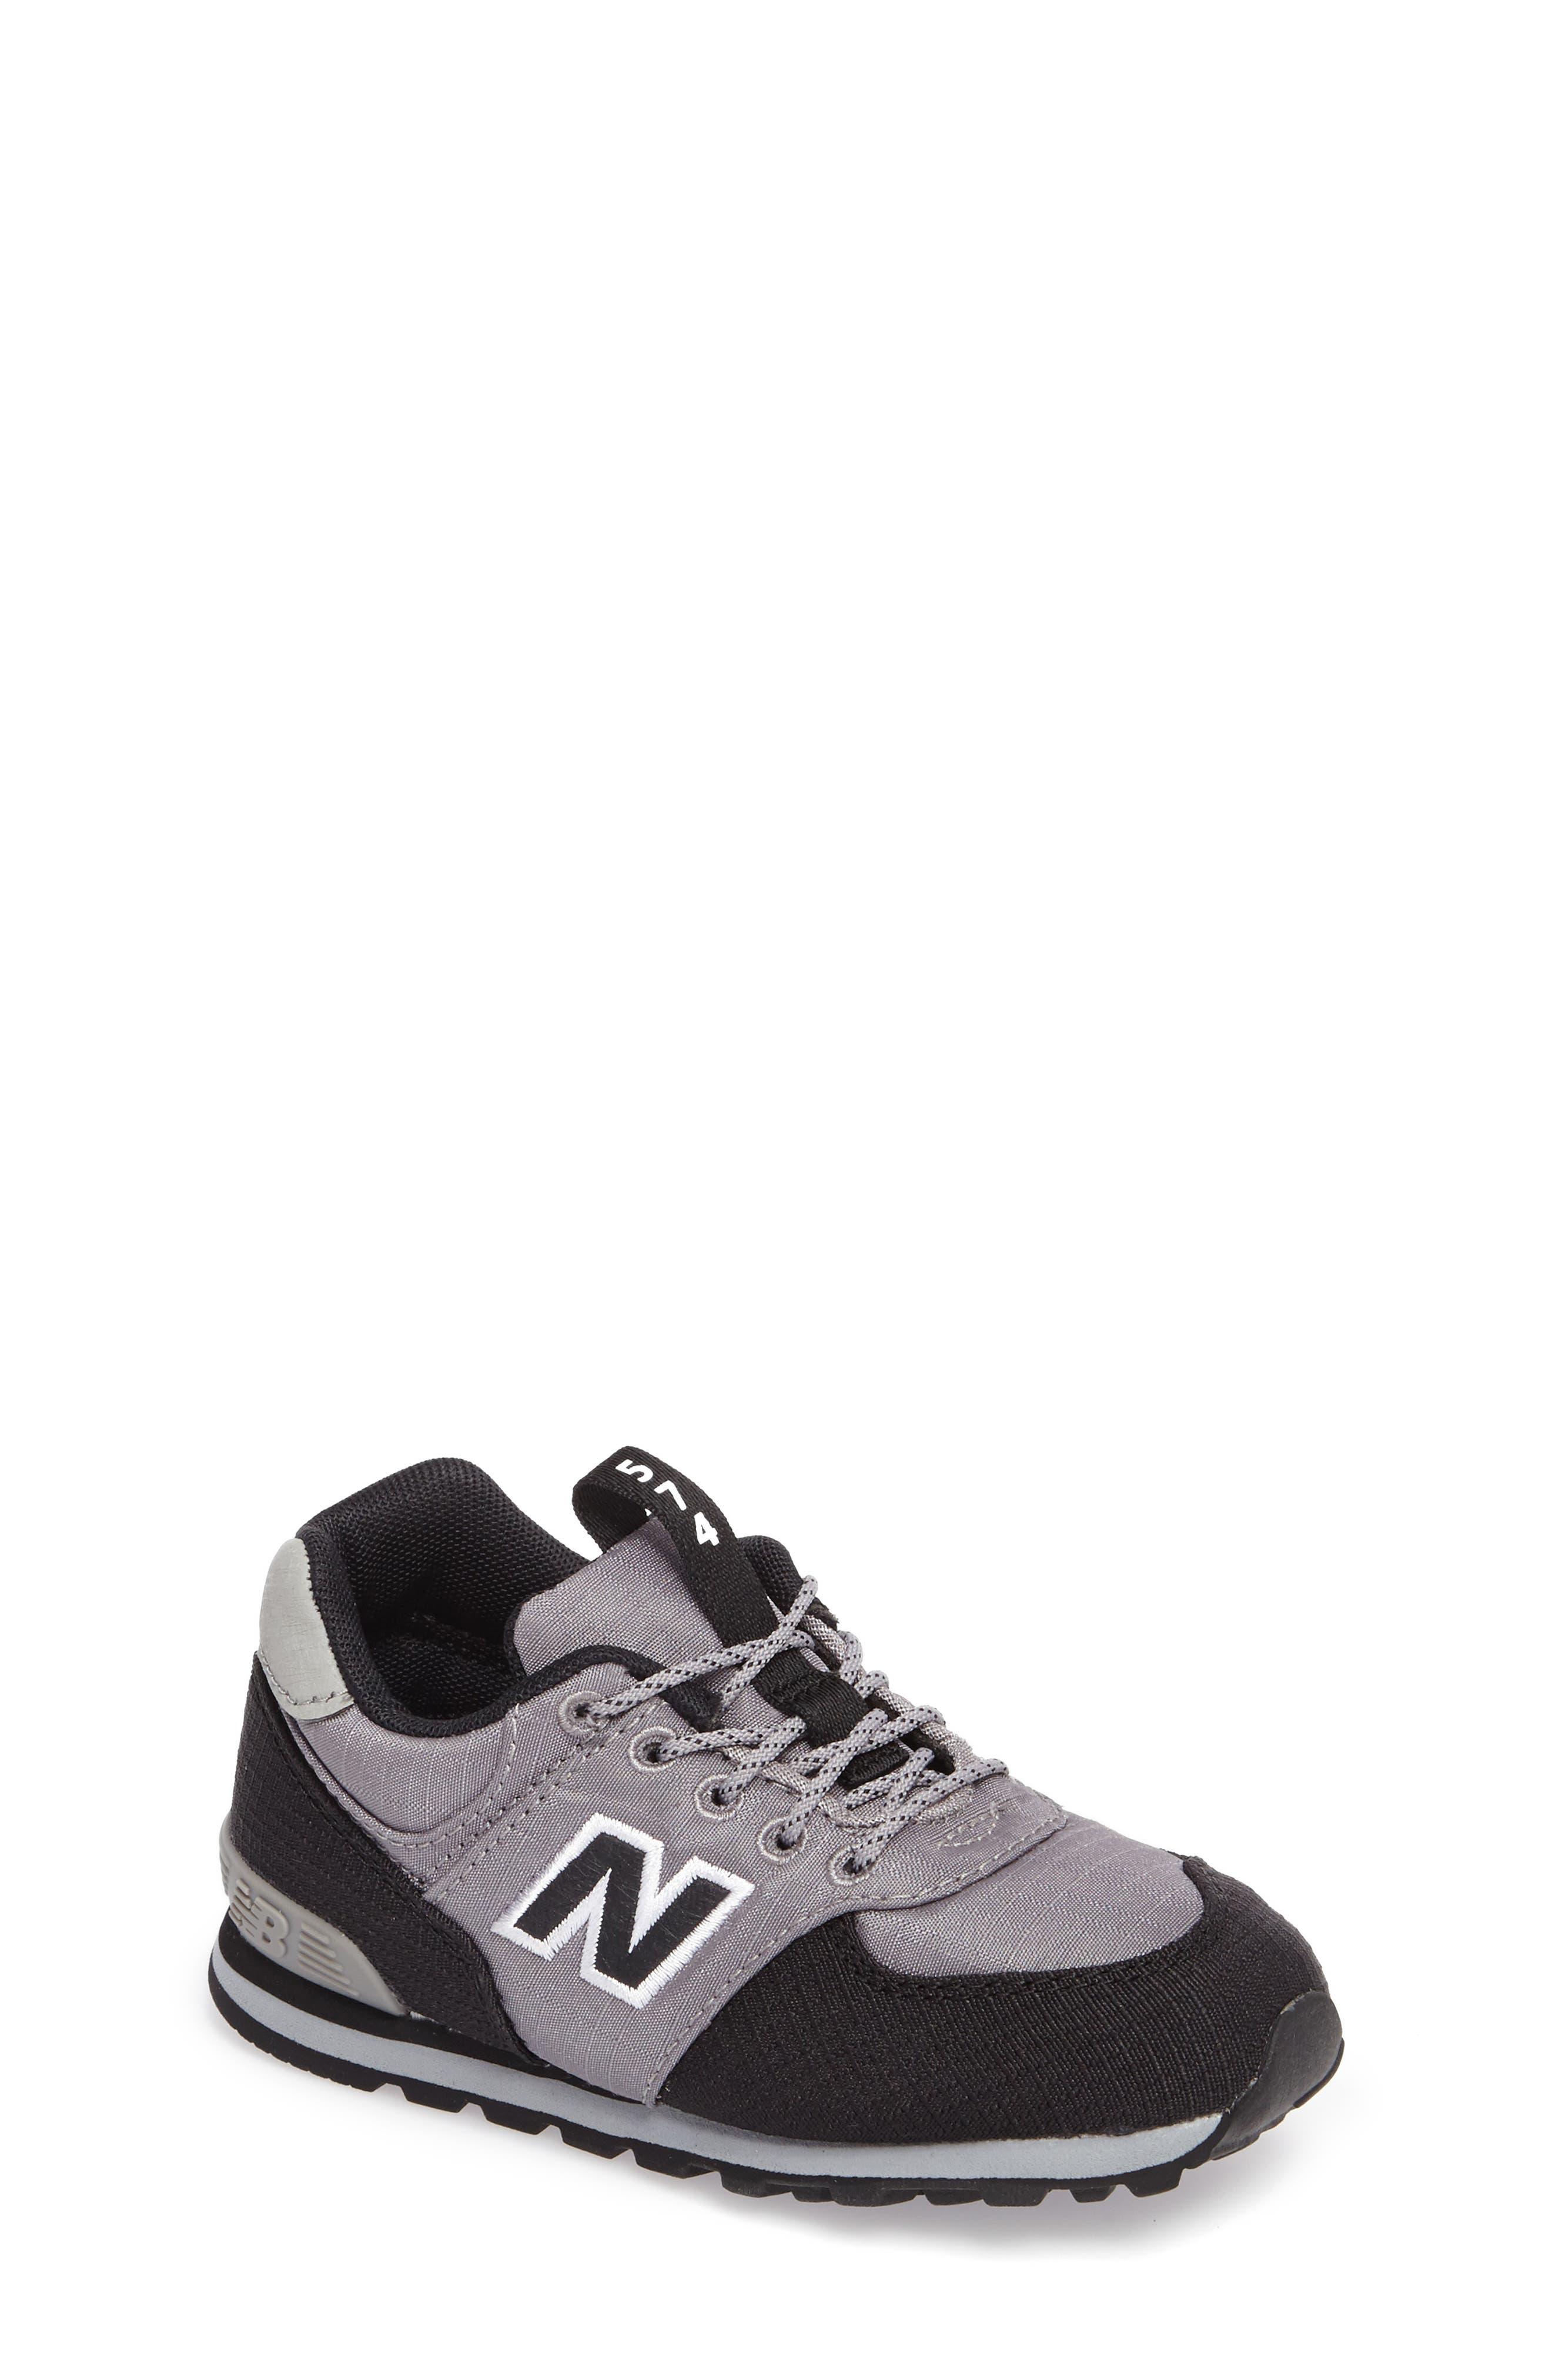 Main Image - New Balance 990 Sneaker (Baby, Walker & Toddler)